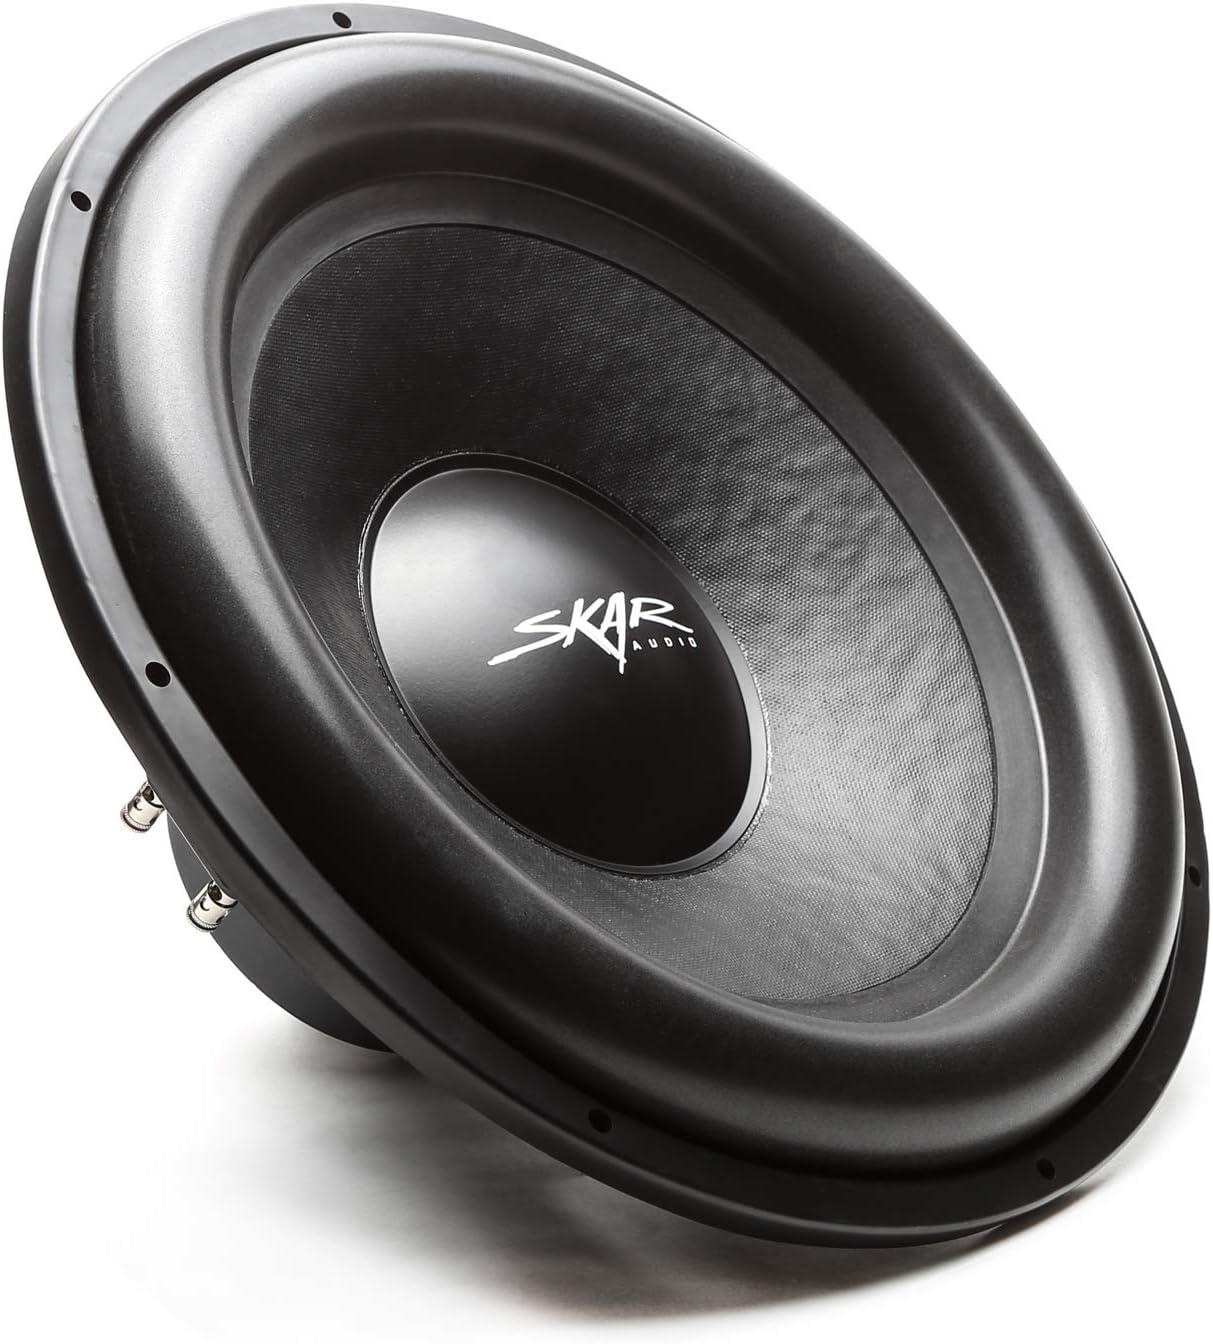 Skar Audio SDR-10 D4 10 1200 Watt Max Power Dual 4 Ohm Car Subwoofer